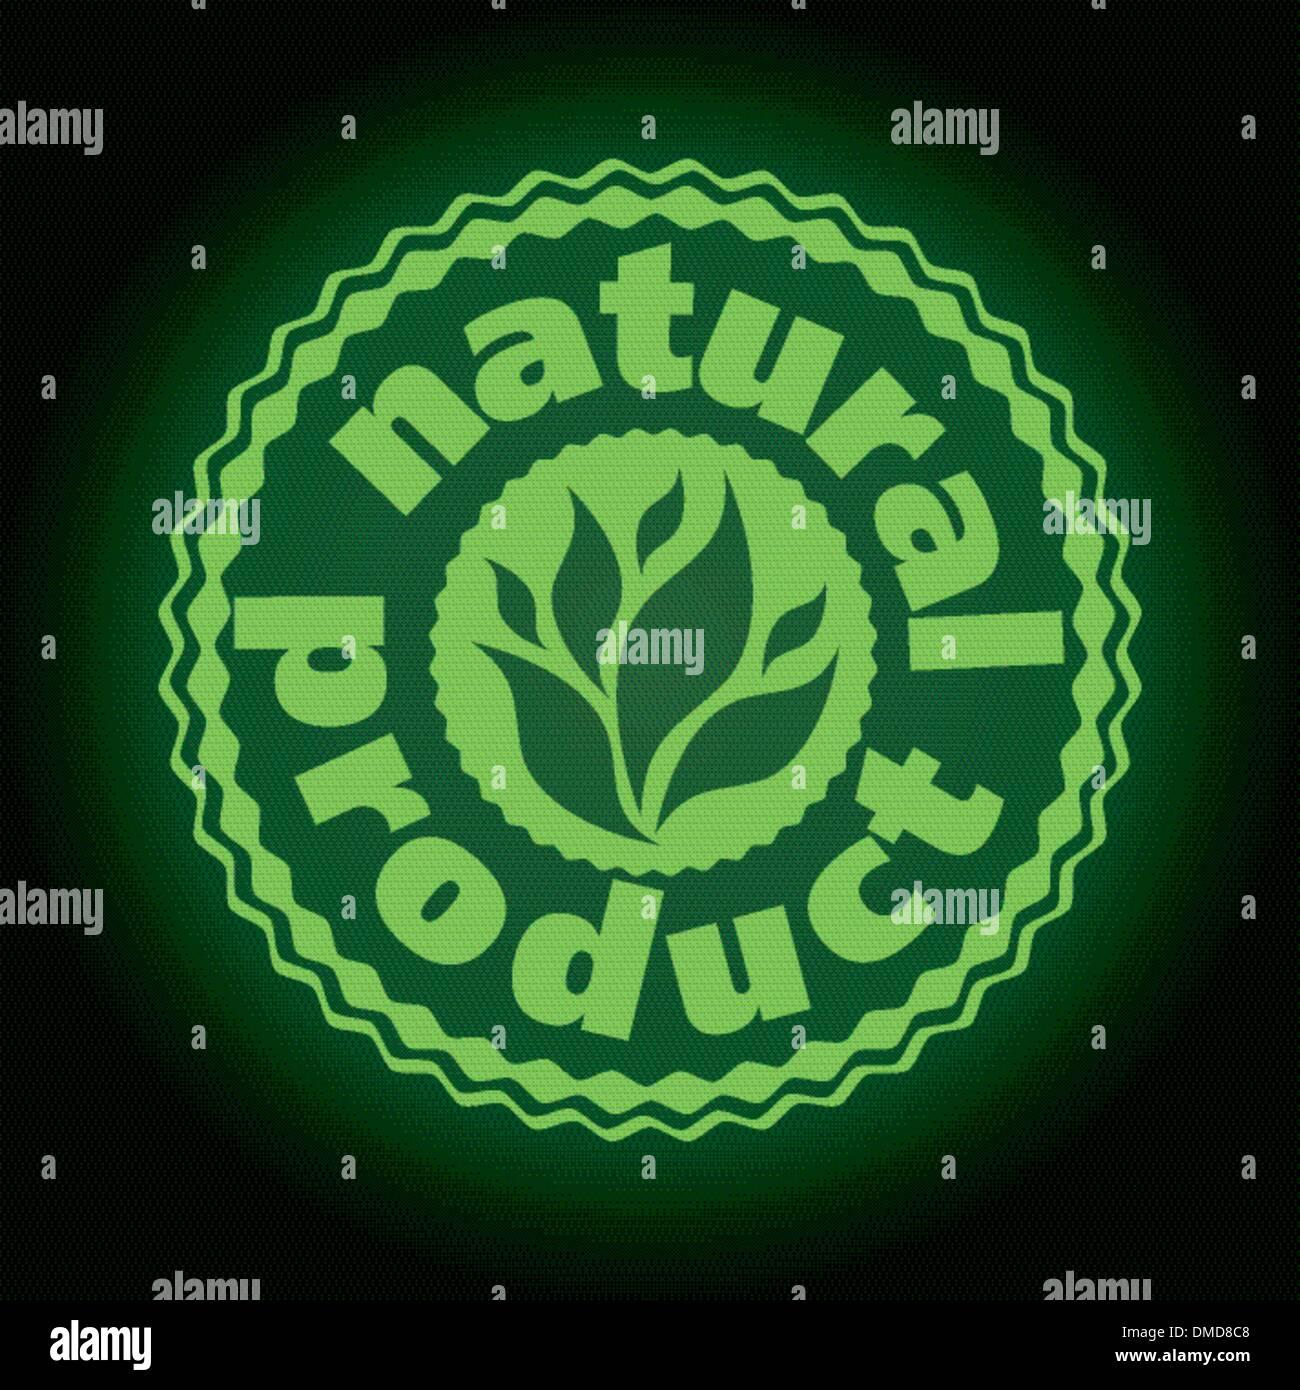 logo printing brand natures product - Stock Image